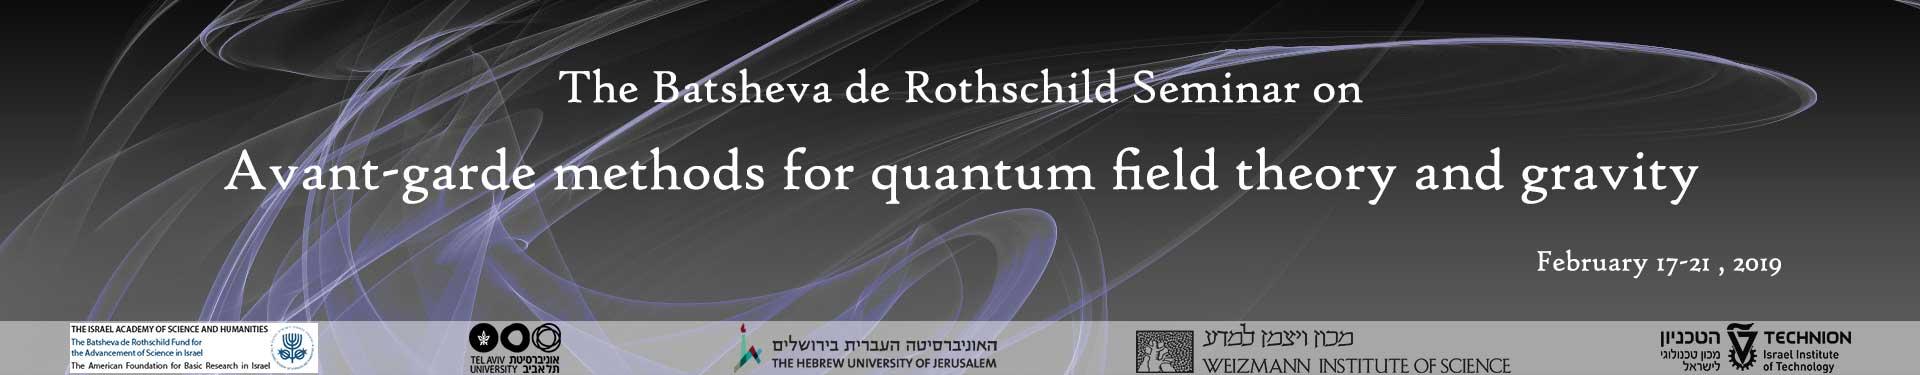 The Batsheva de Rothschild Seminar on avant-garde methods for quantum field theory and gravity. Feb. 2019